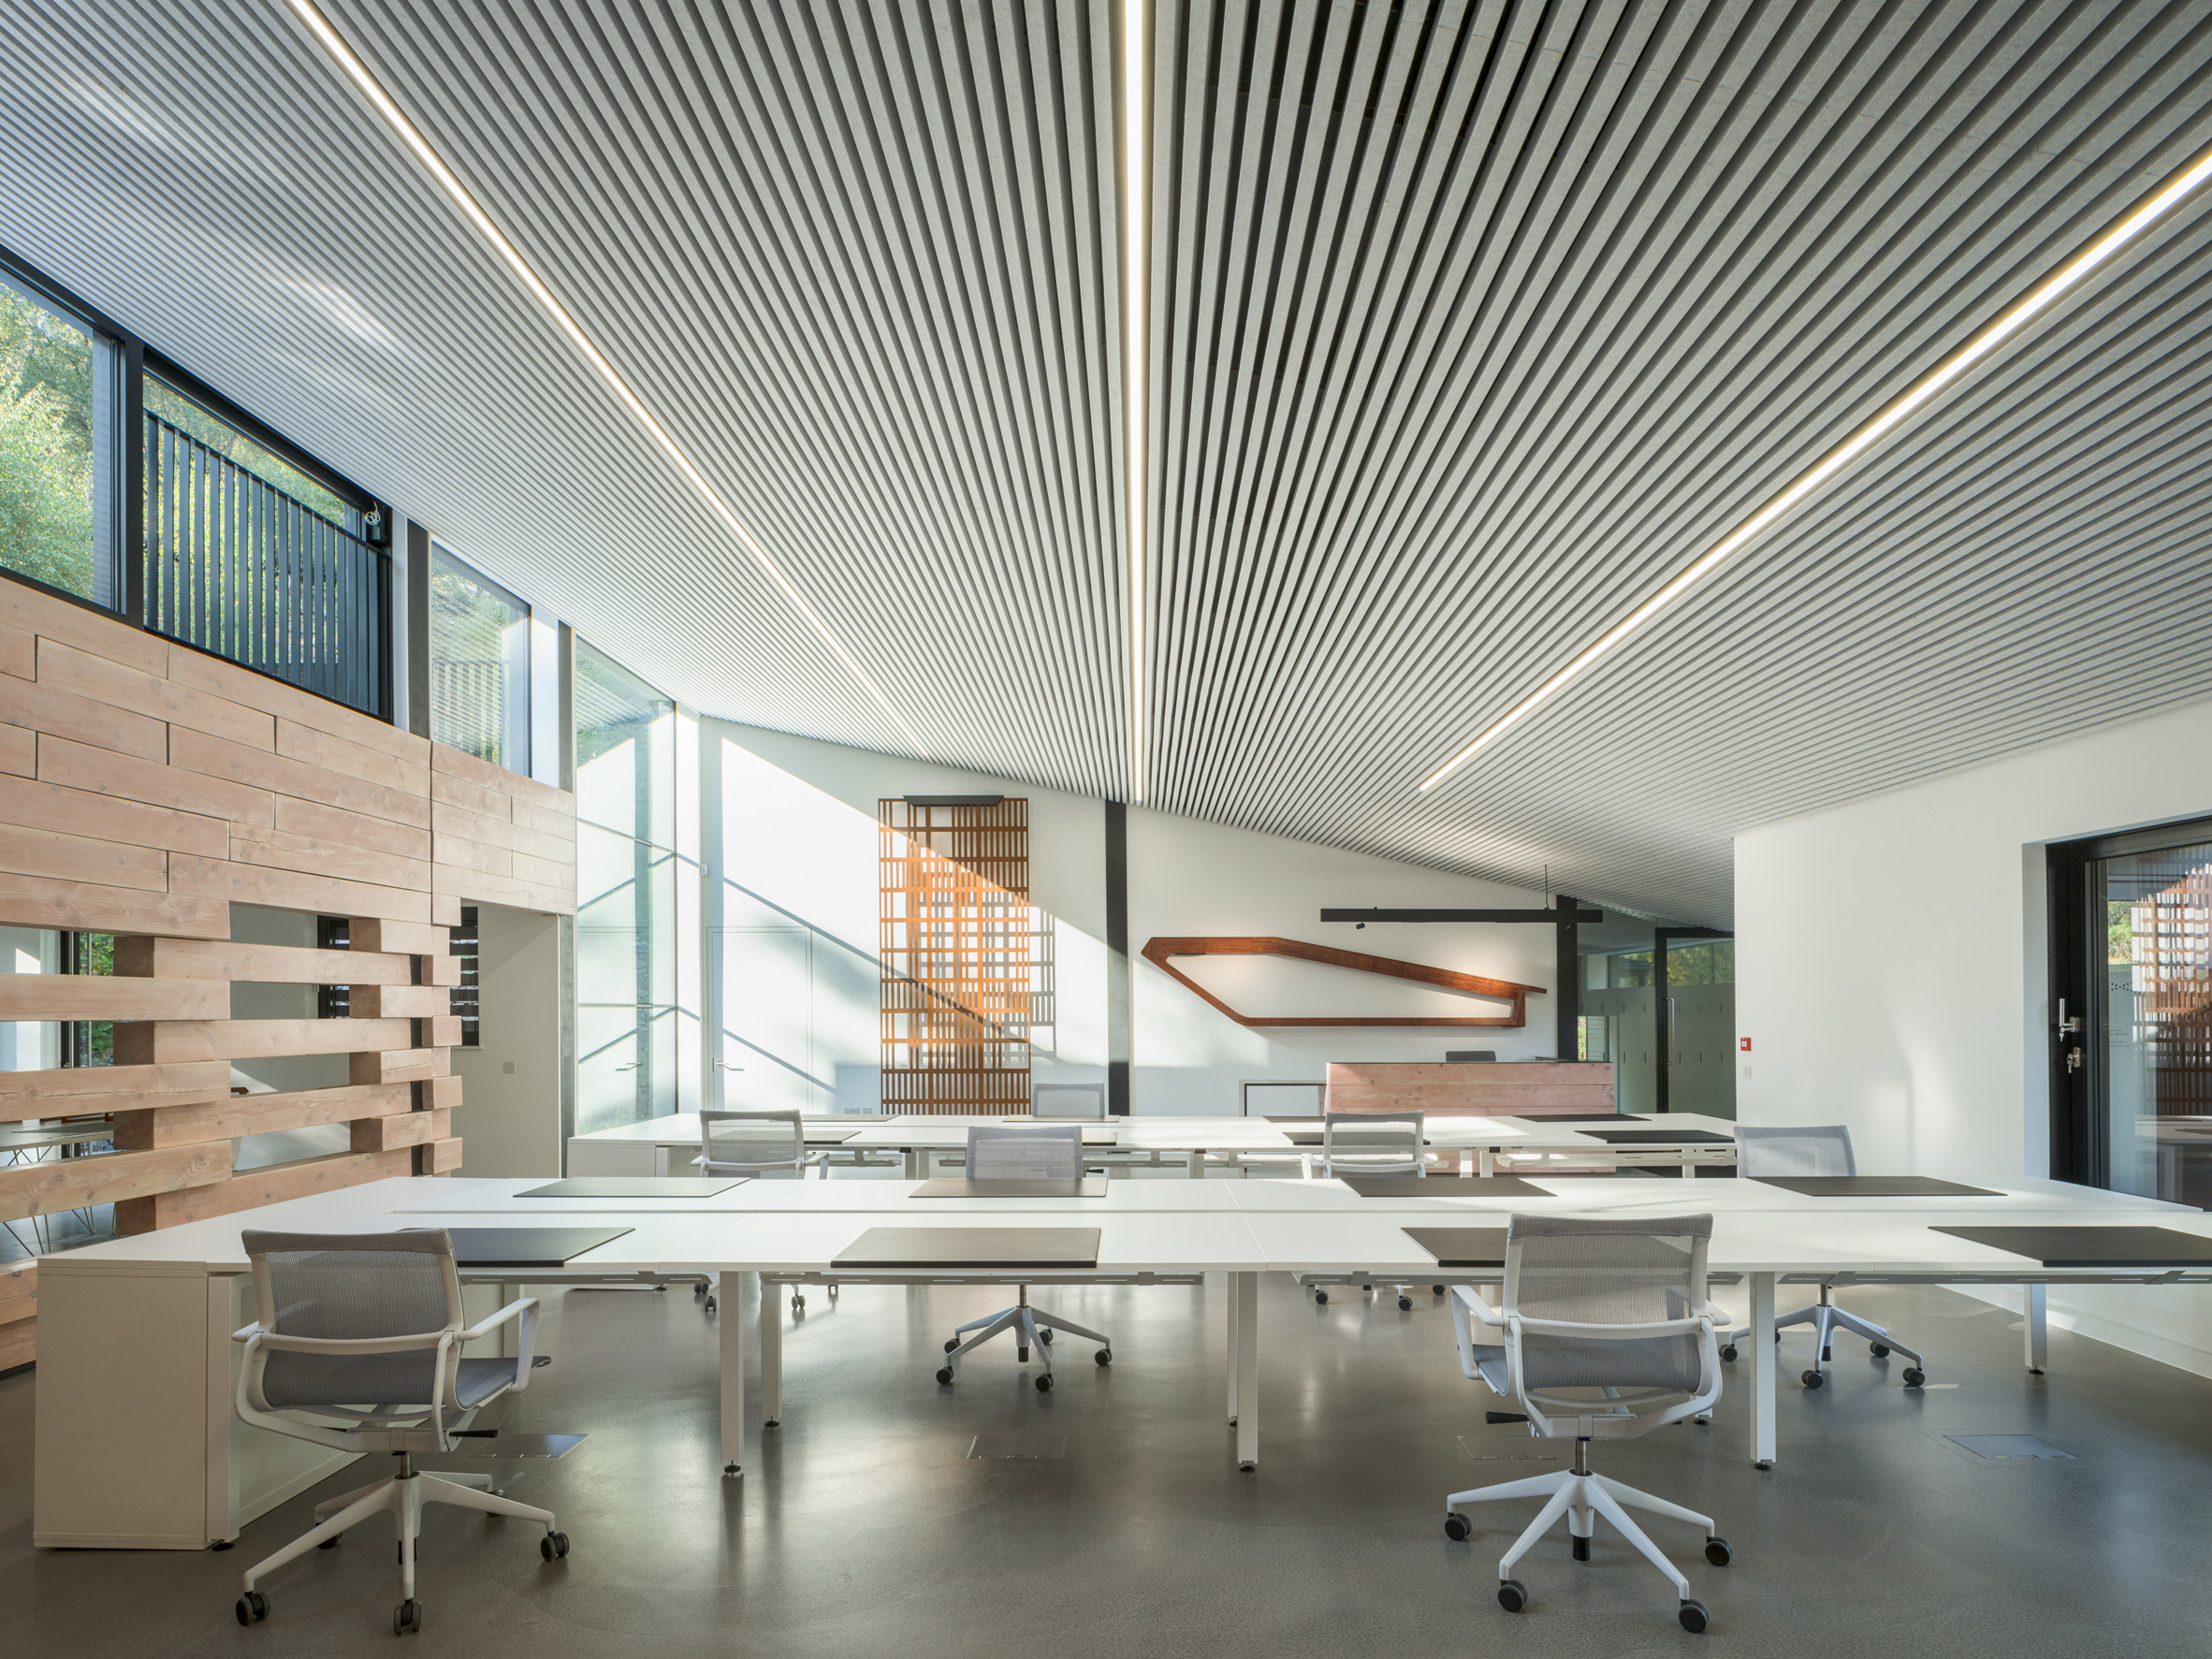 Clerestory windows allow light into Quarry Studios by Moxon Architects